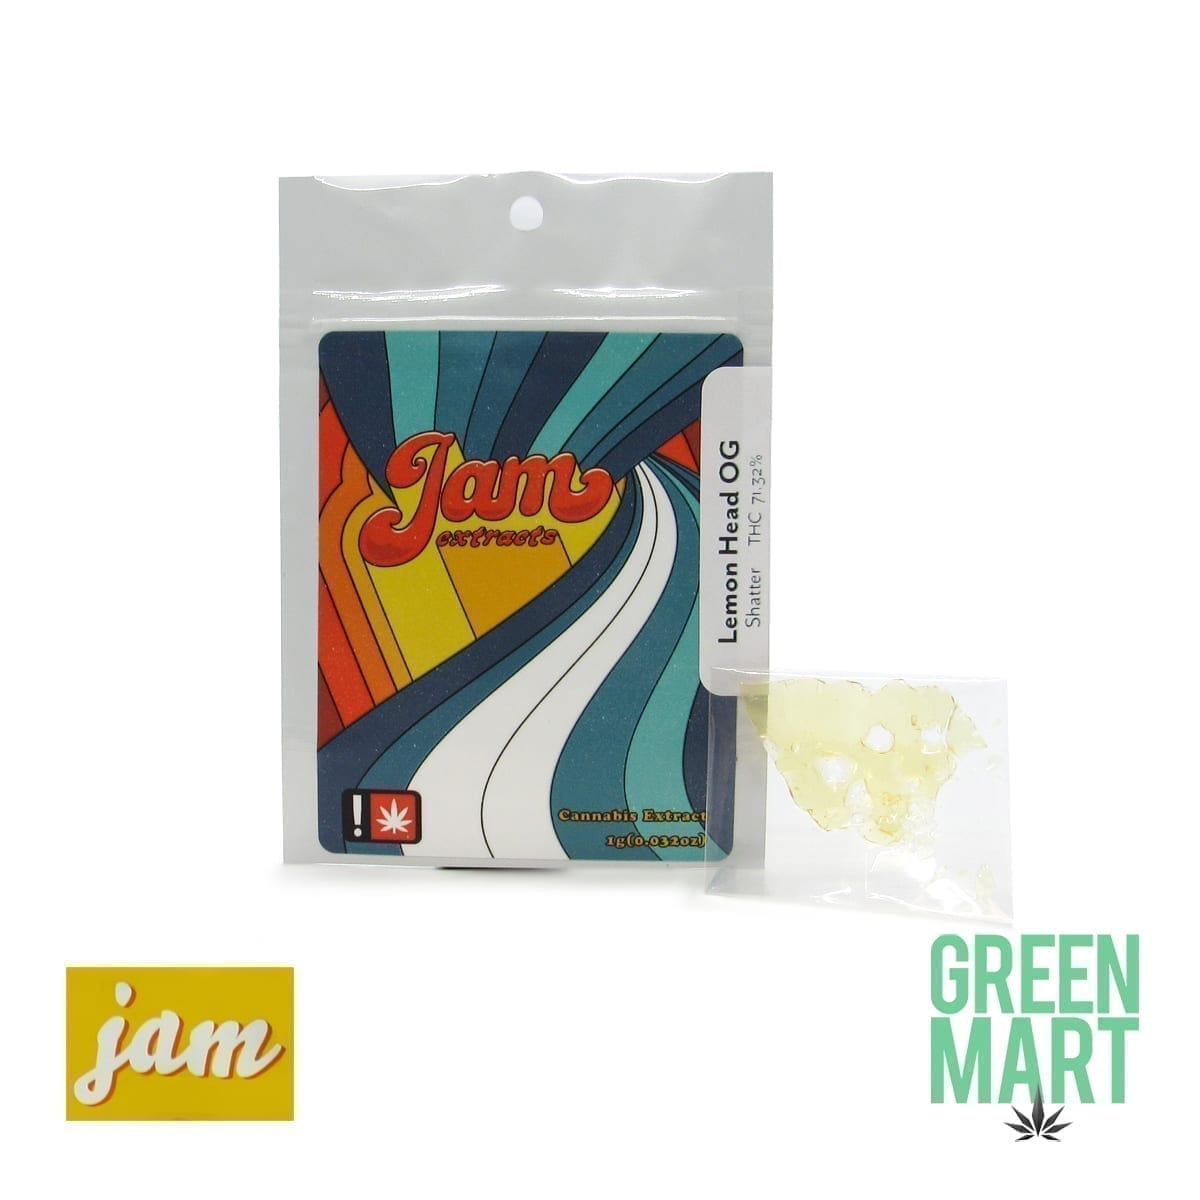 JAM - Lemonhead OG